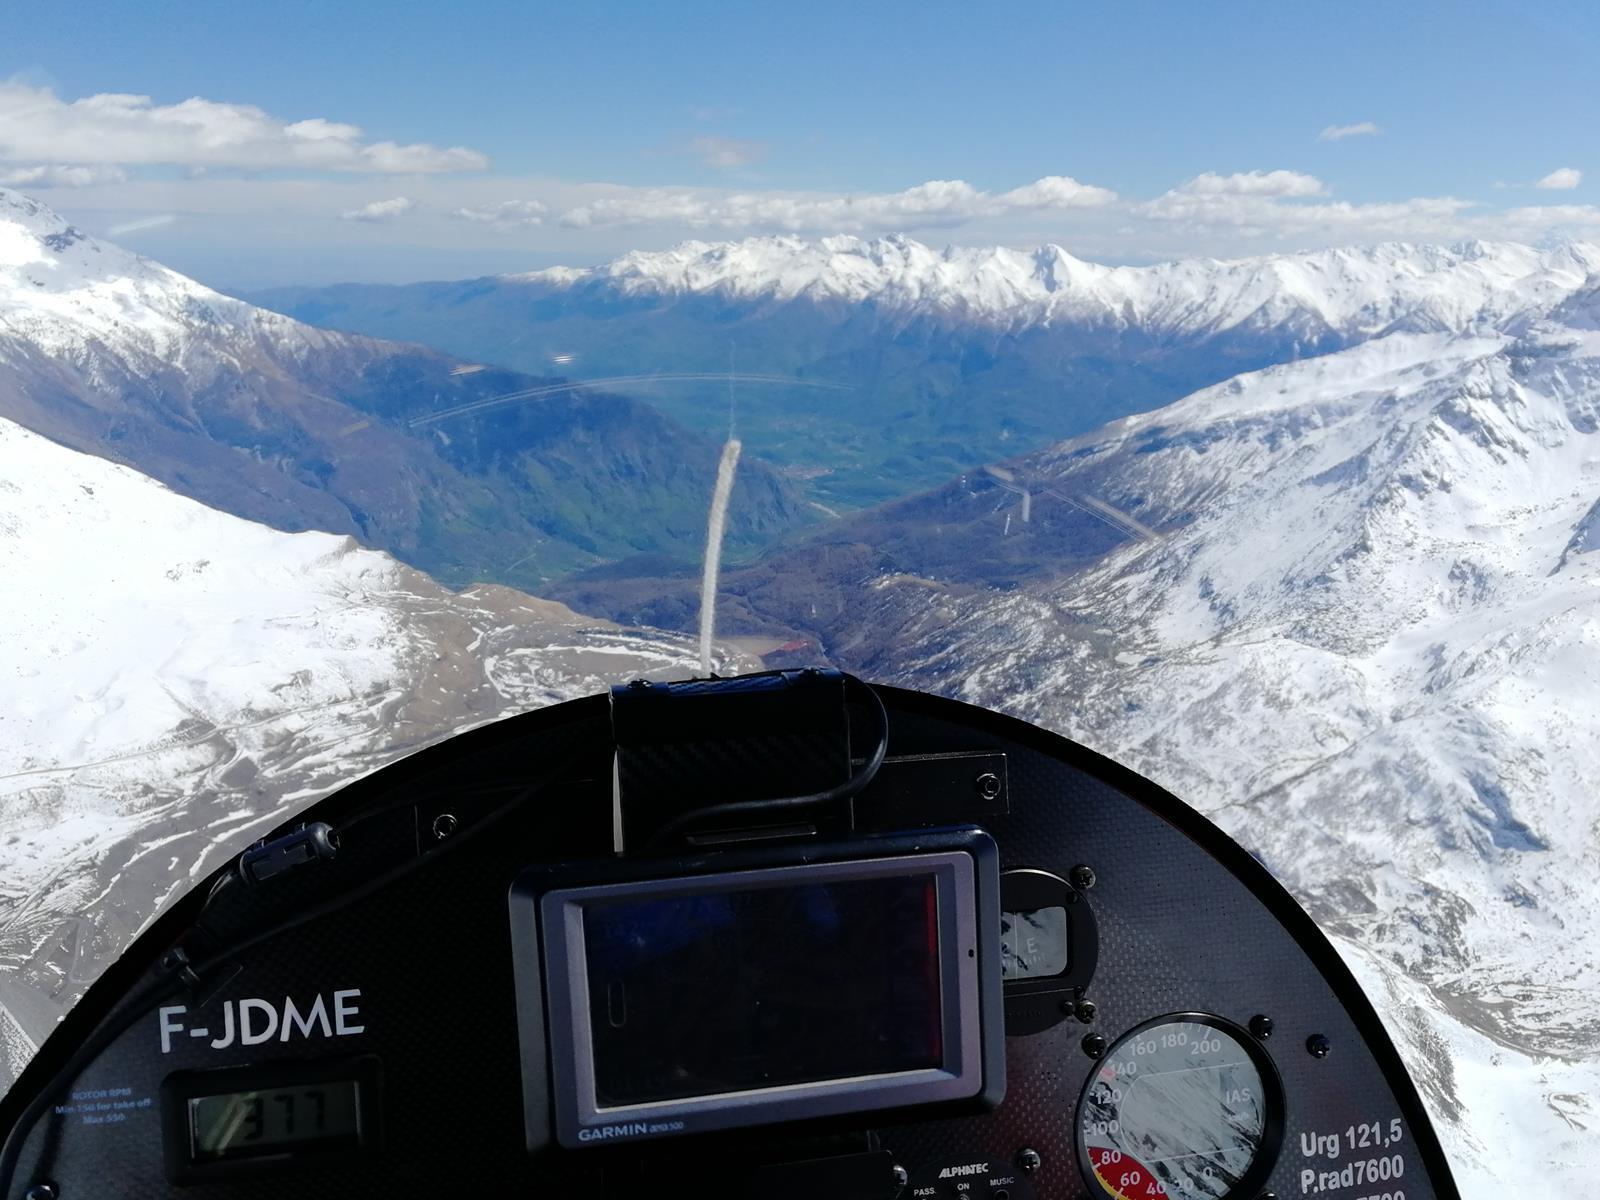 Autogire ULM Rhône-Alpes Isere Drôme